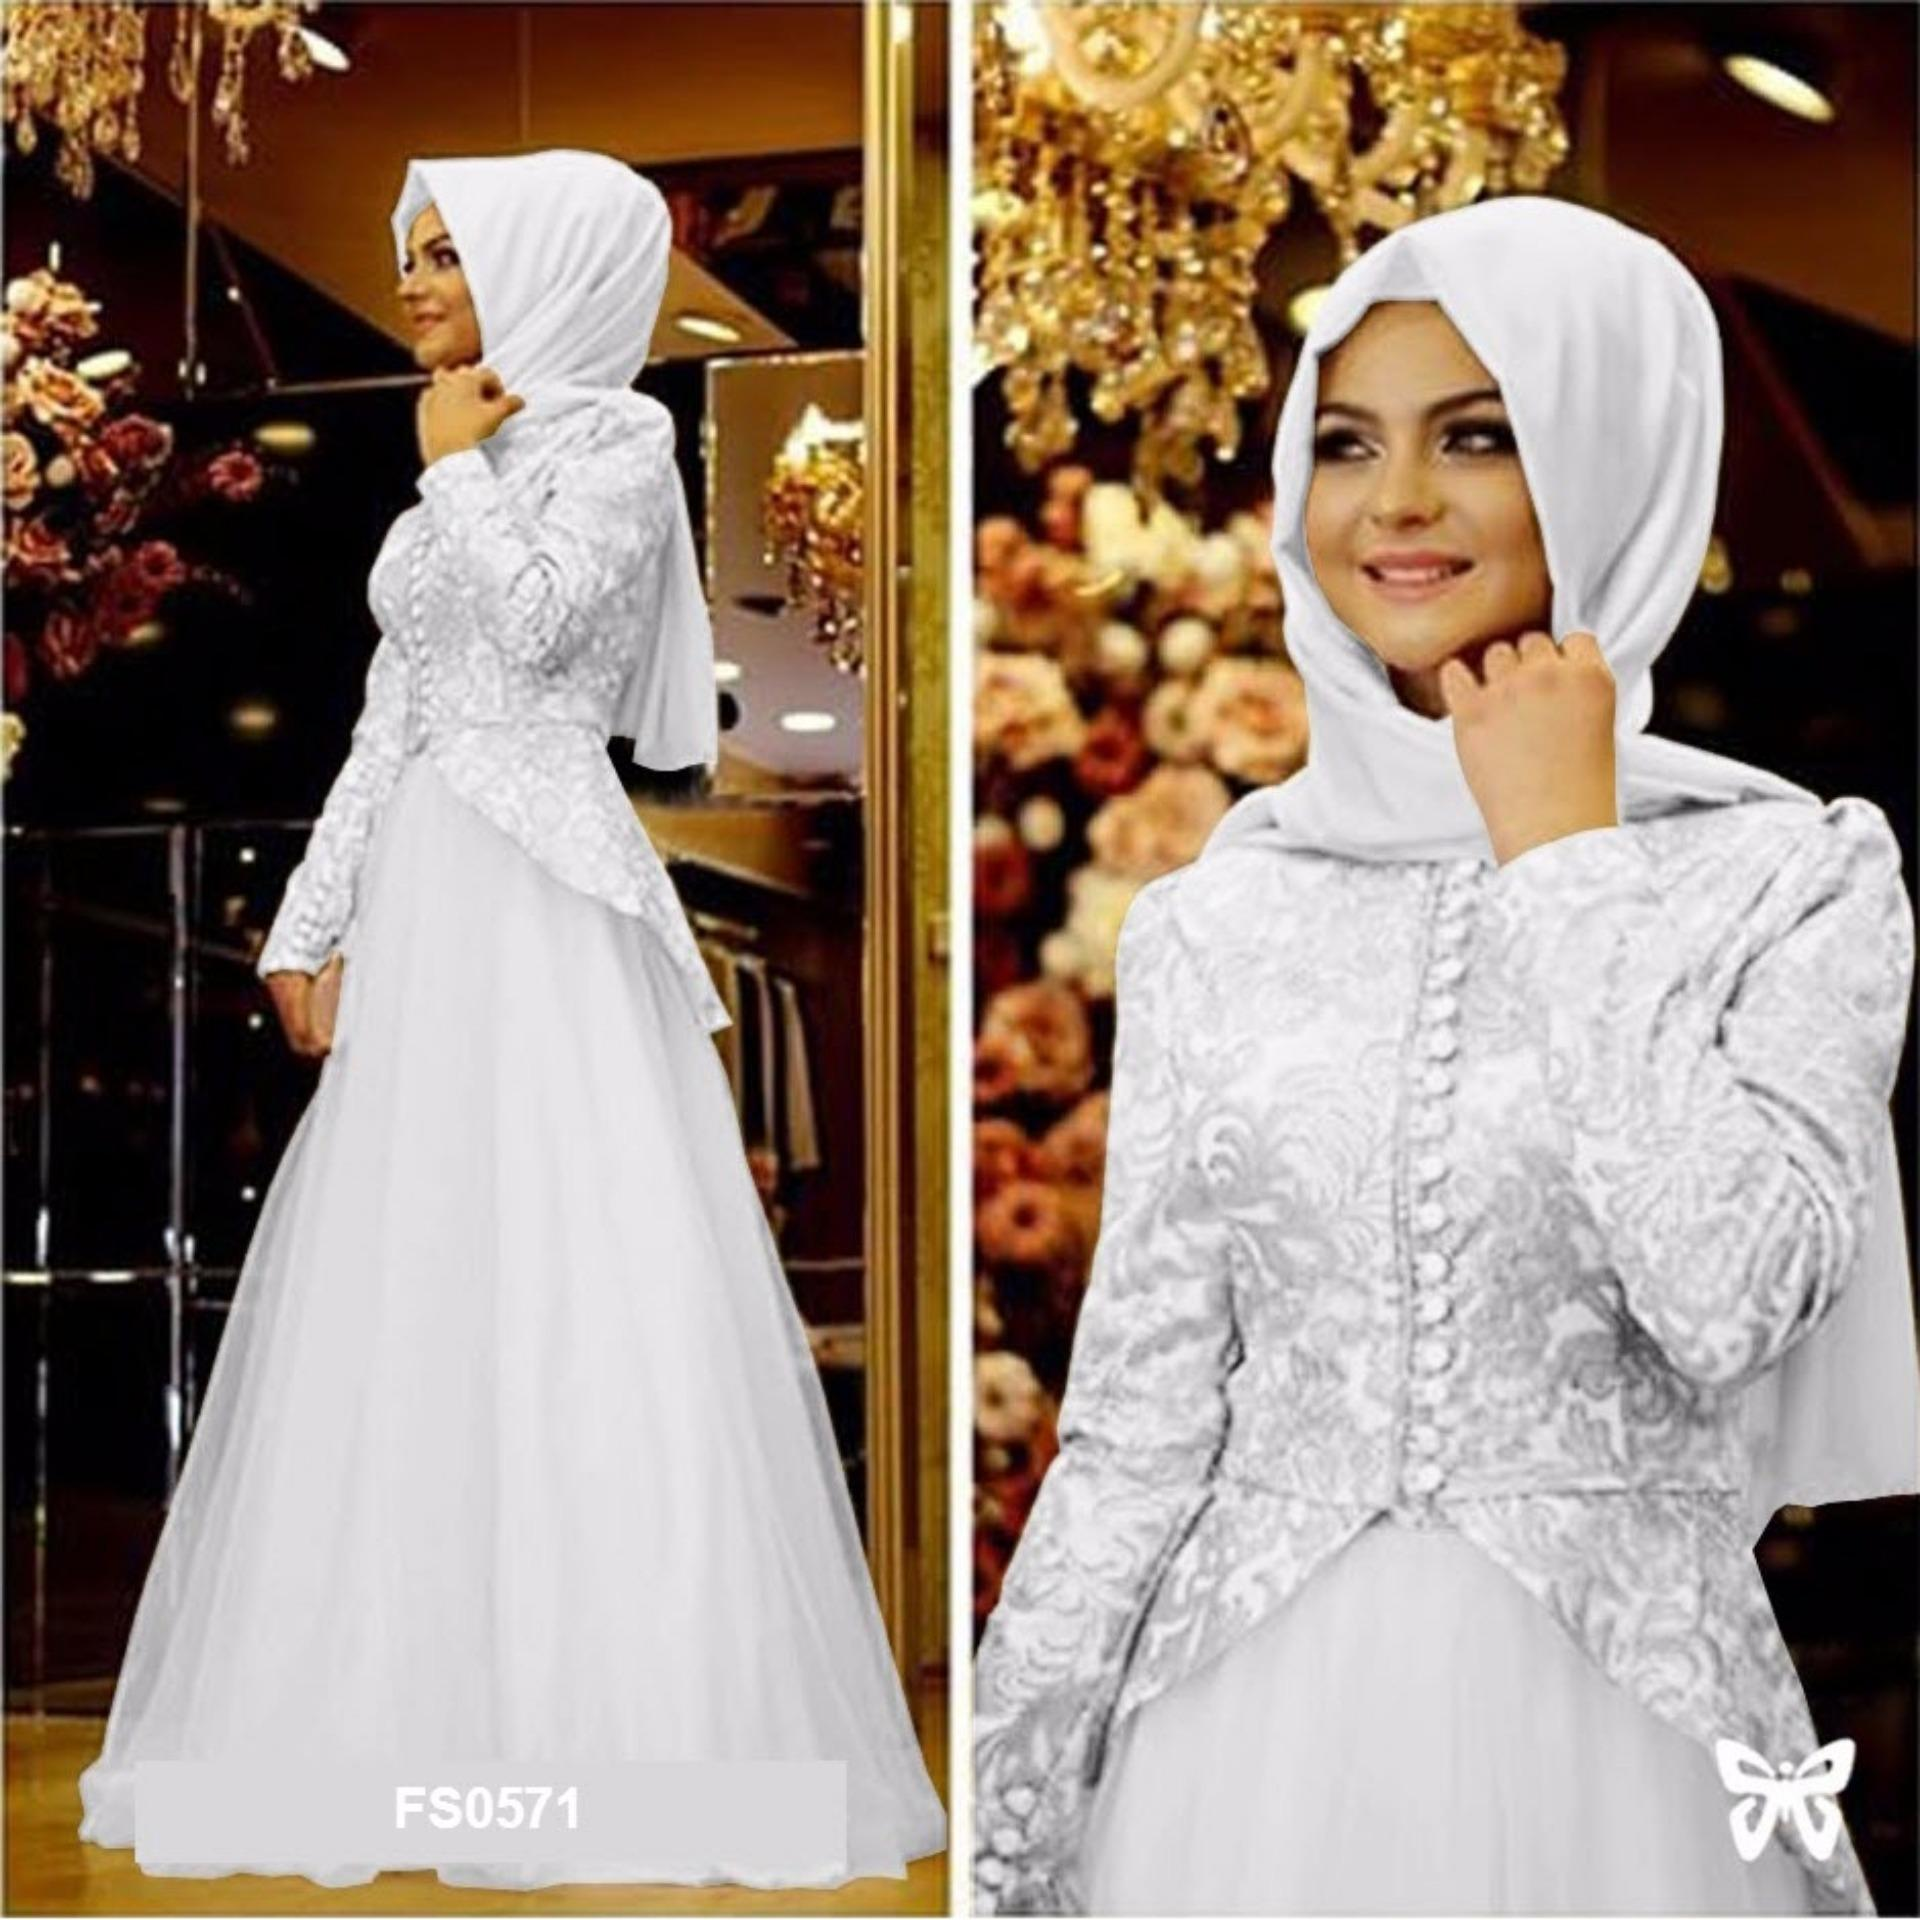 Flavia Store Maxi Dress Lengan Panjang FS0571 PUTIH Gamis Gaun Pesta Muslimah